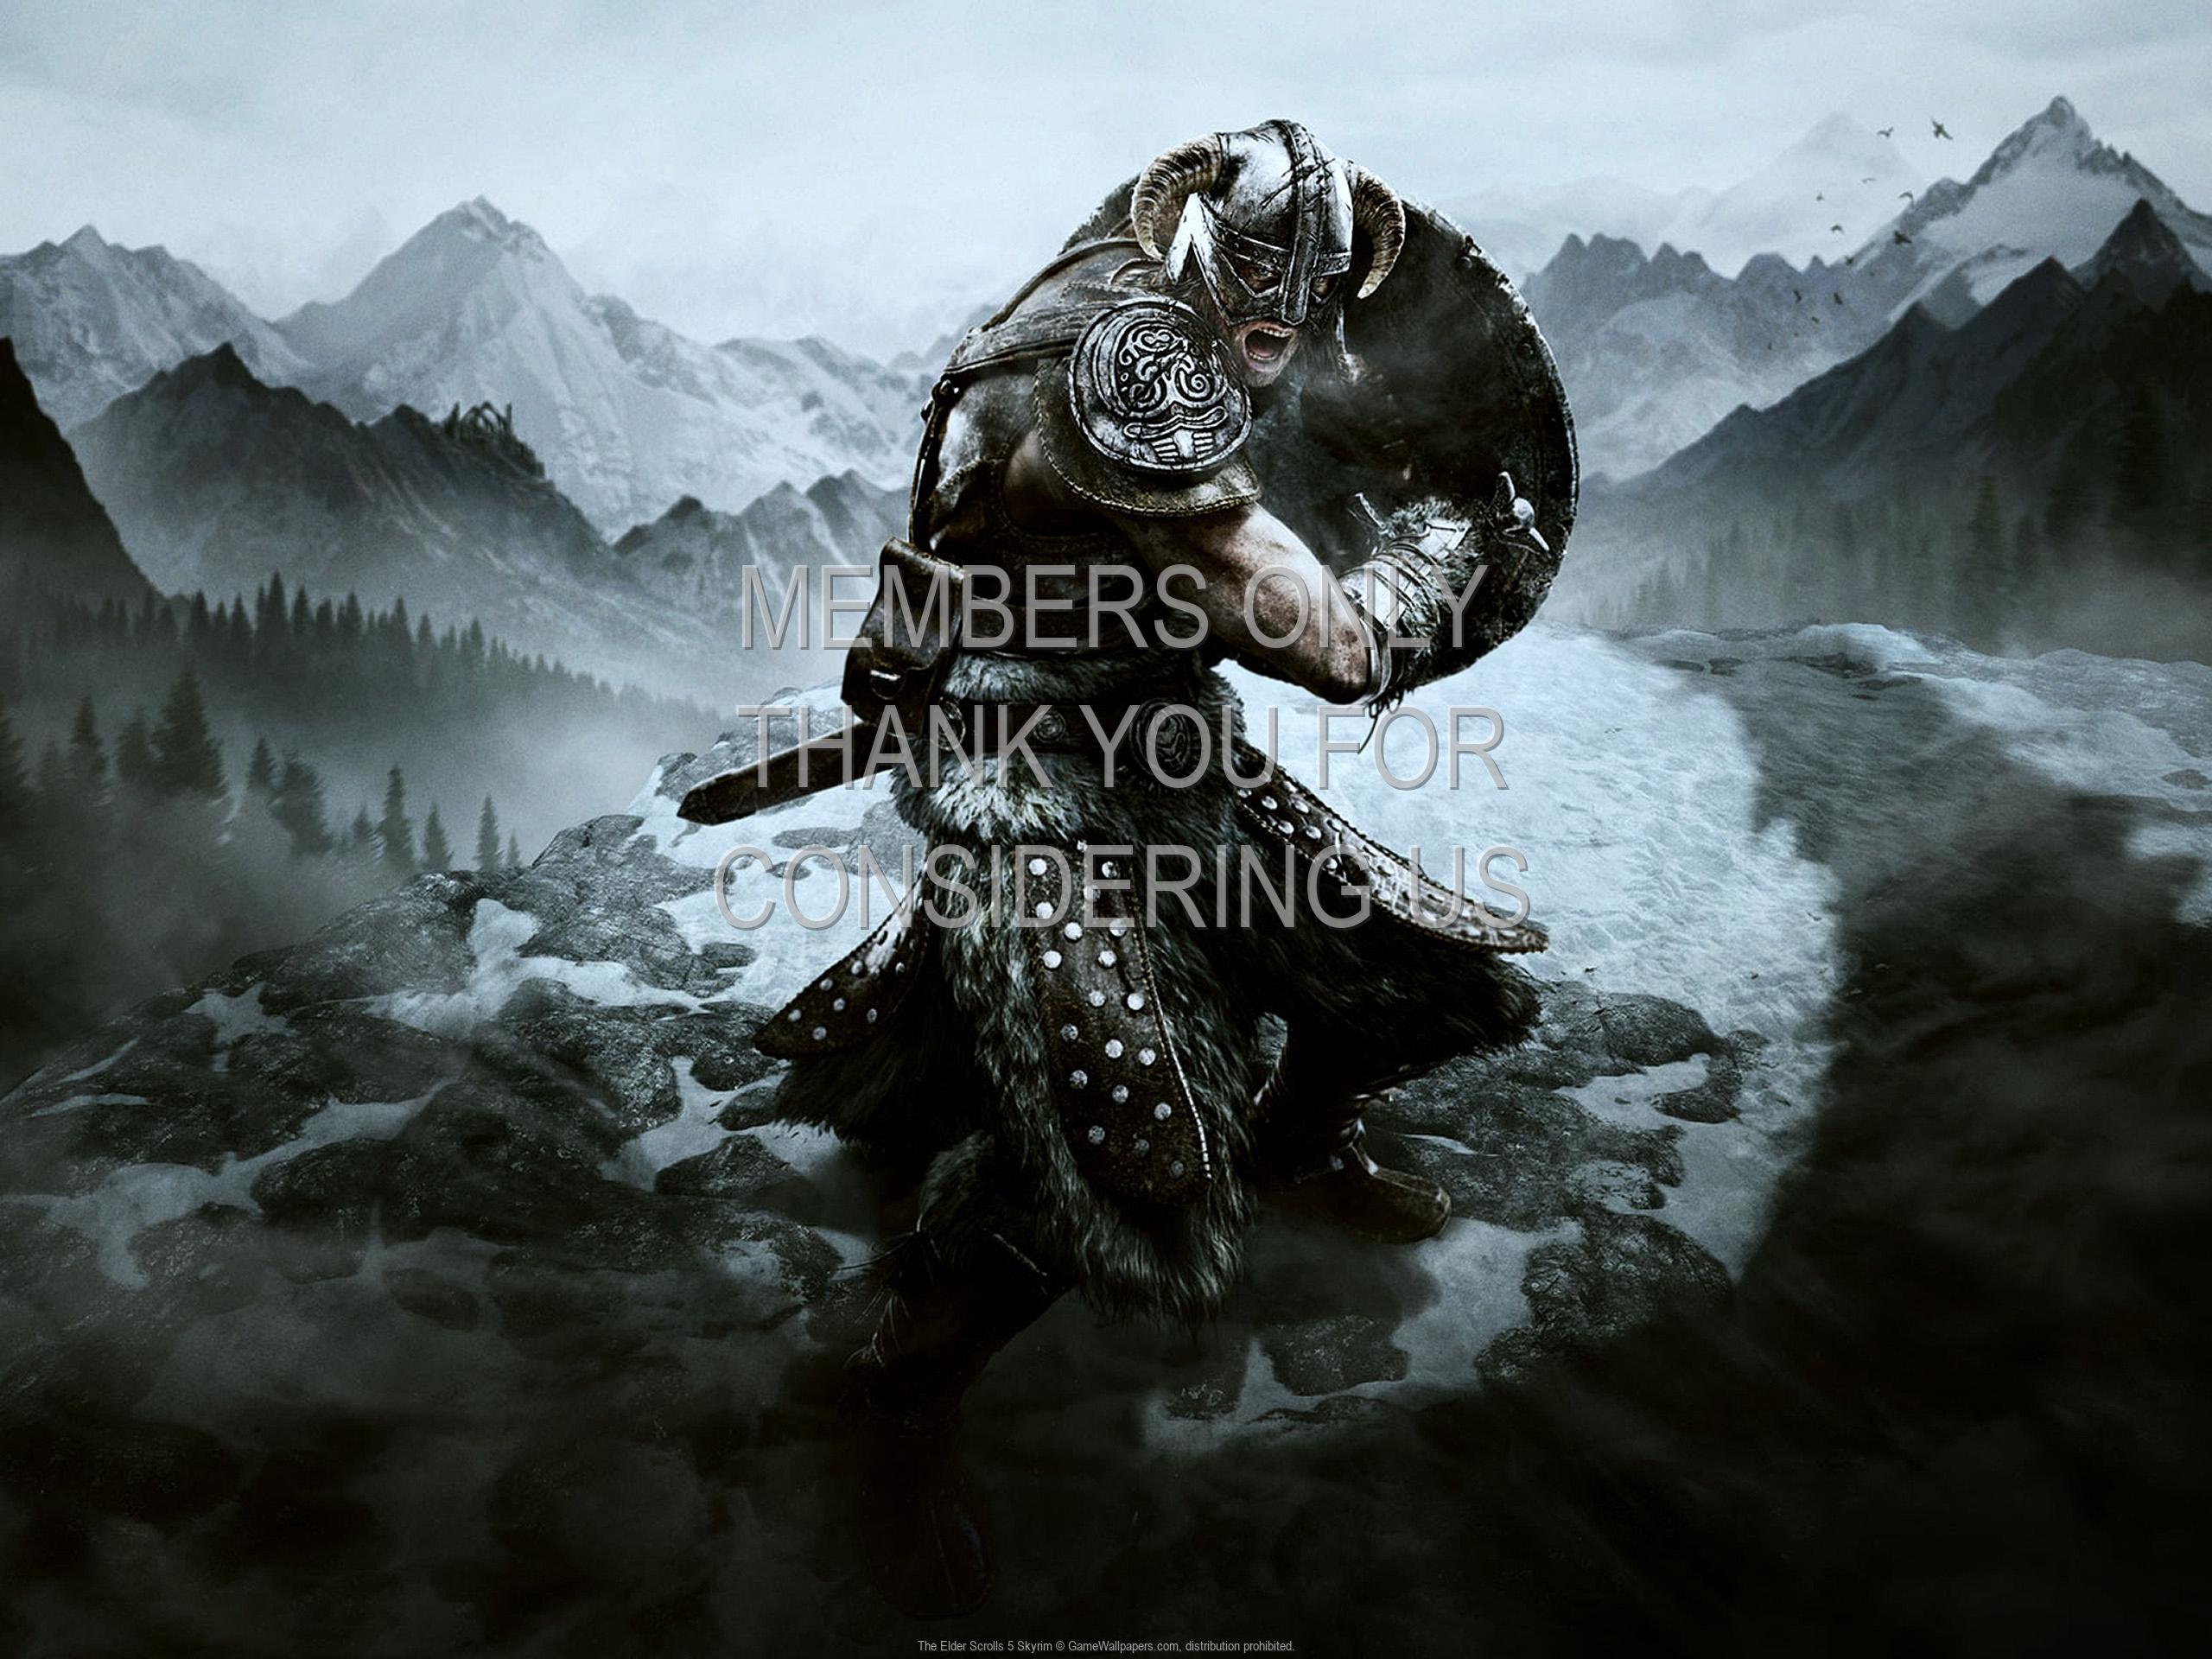 The Elder Scrolls 5: Skyrim 1920x1080 Mobile wallpaper or background 03